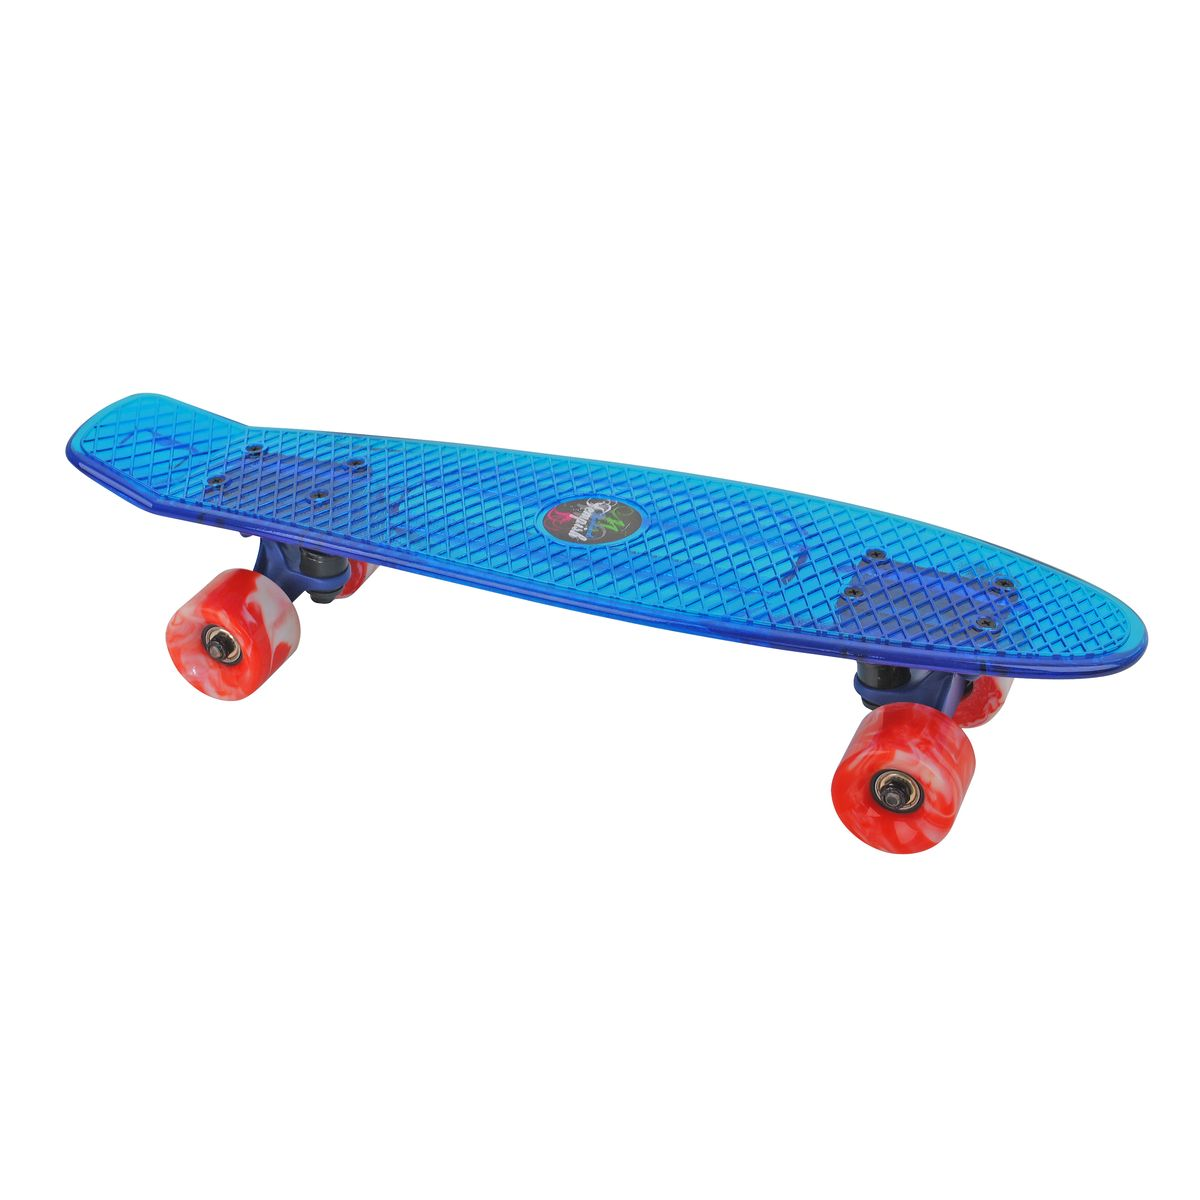 Скейтборд пластиковый Tempish Retro Buffy Star, цвет: голубойMHDR2G/AПени борд Tempish Buffy нагрузка до 100 кг